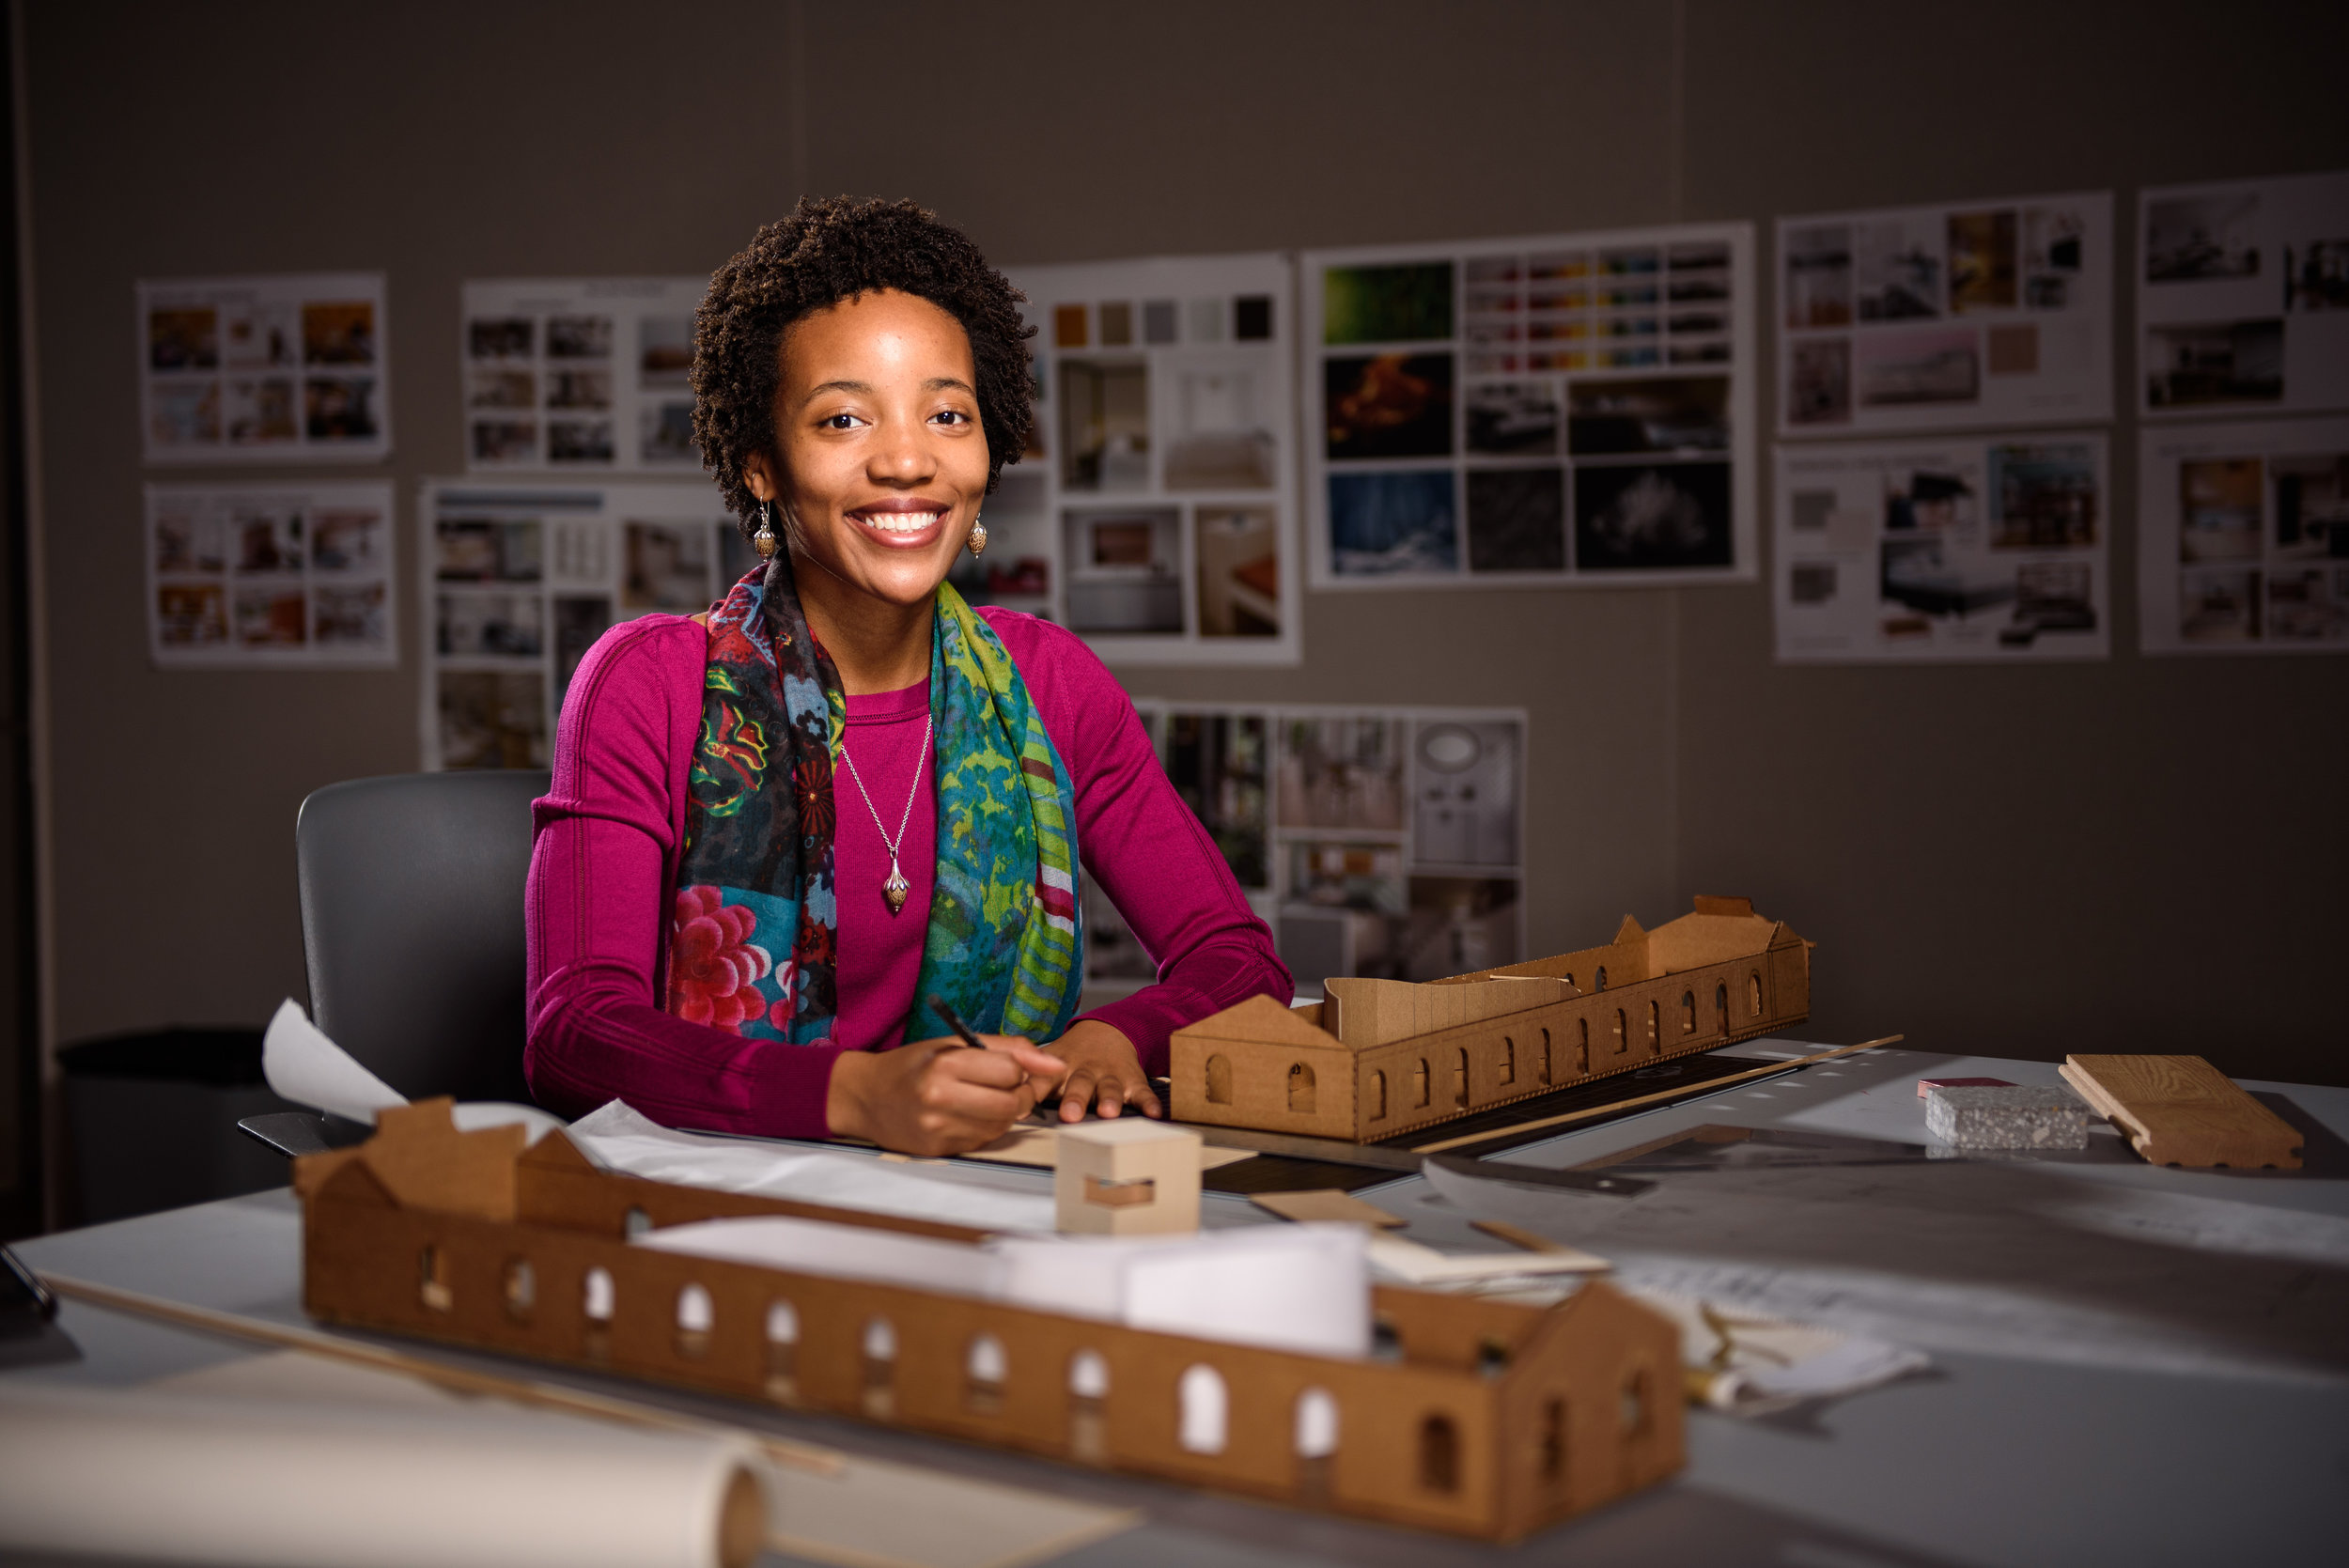 Portrait of student Dani MCKenzie photographed in Washington, DC for George Washington University.